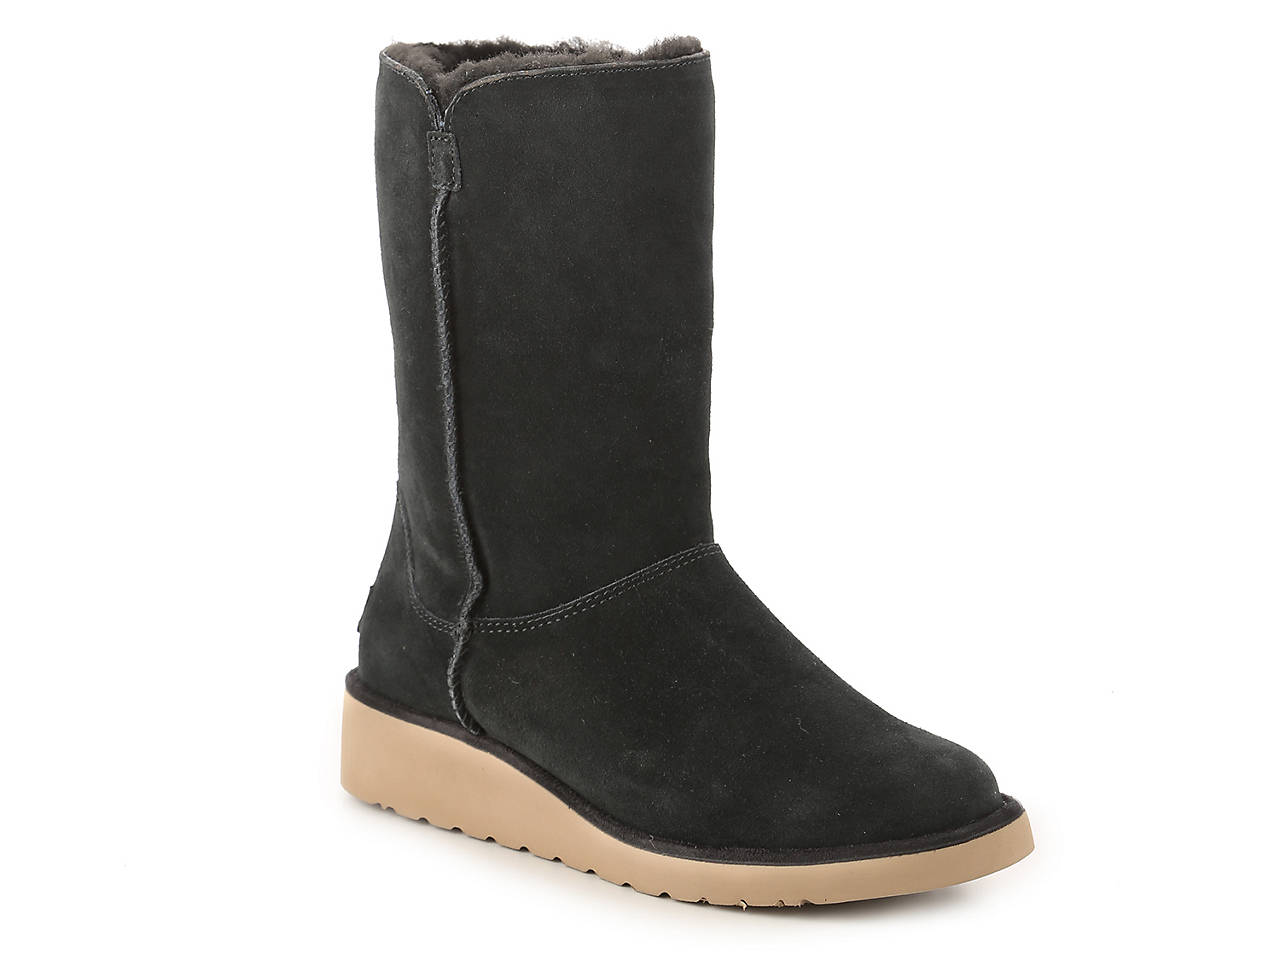 b0d3e66eea8 Classic Slim Short Boot